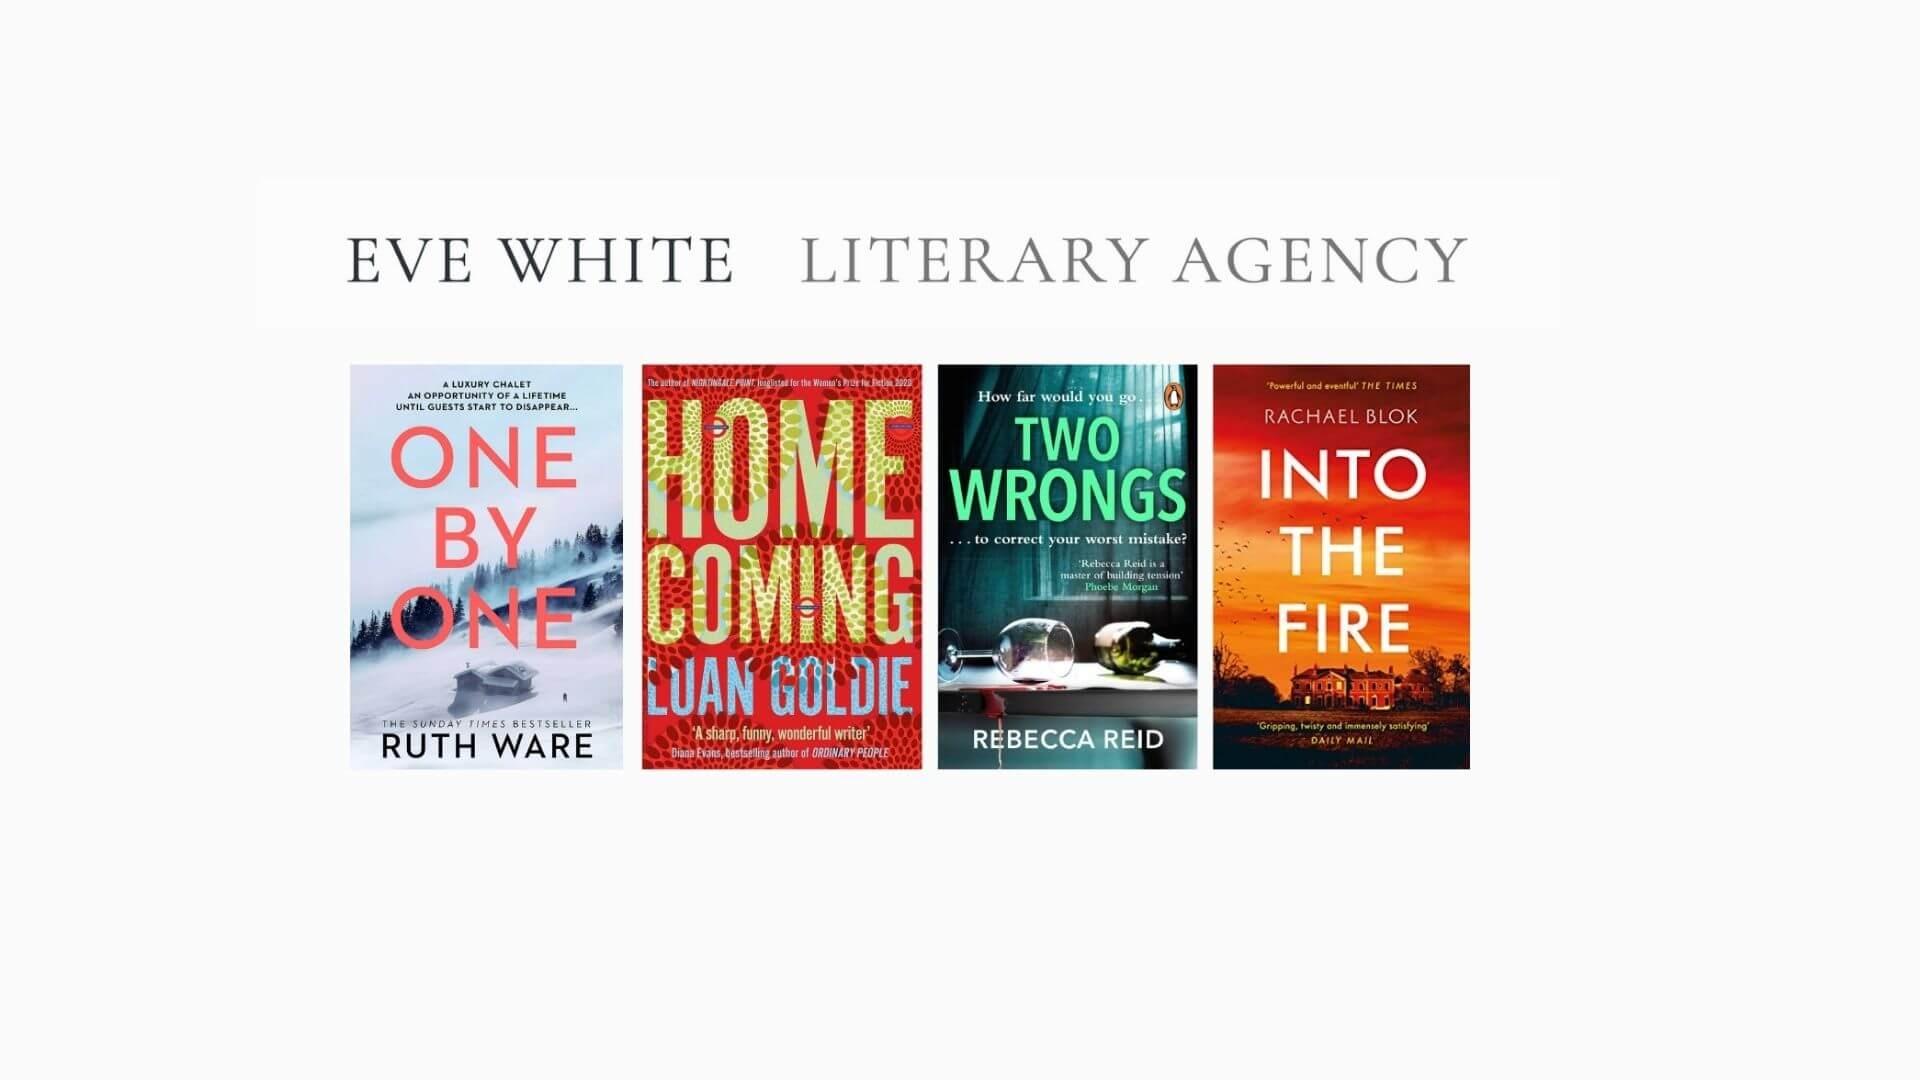 Eve White Literary Agency